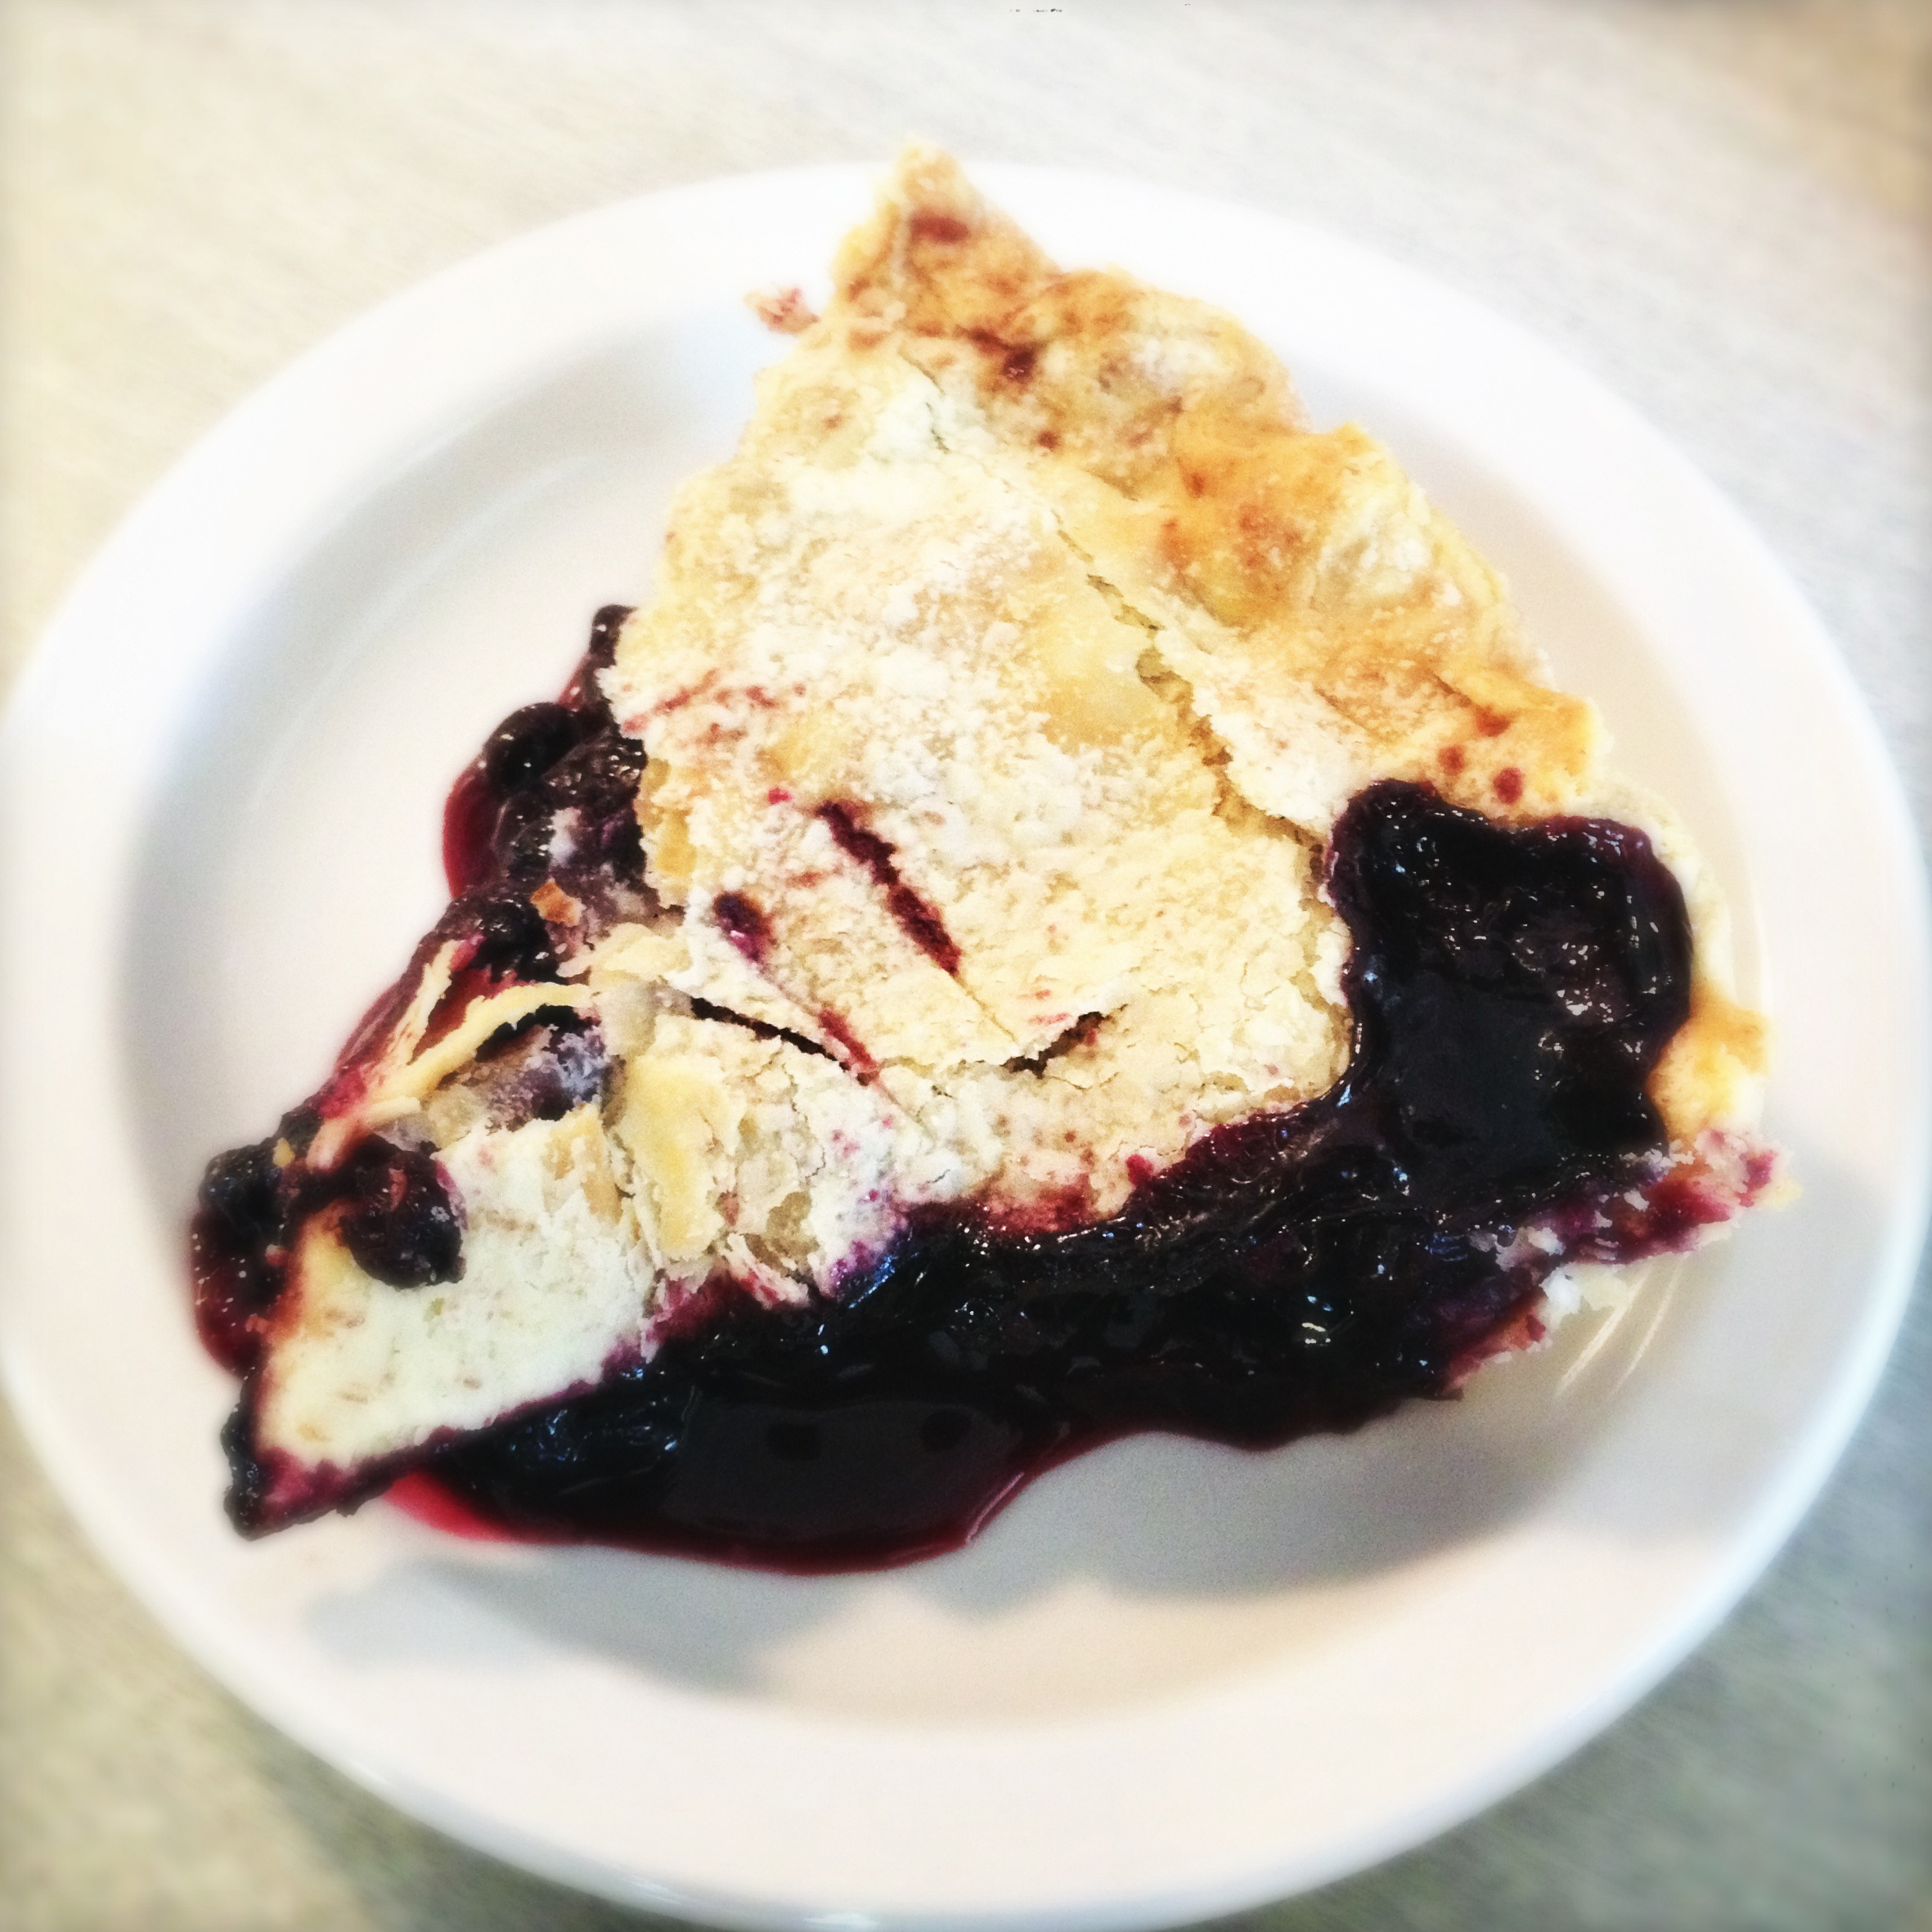 Huckleberry Pie, nommy.